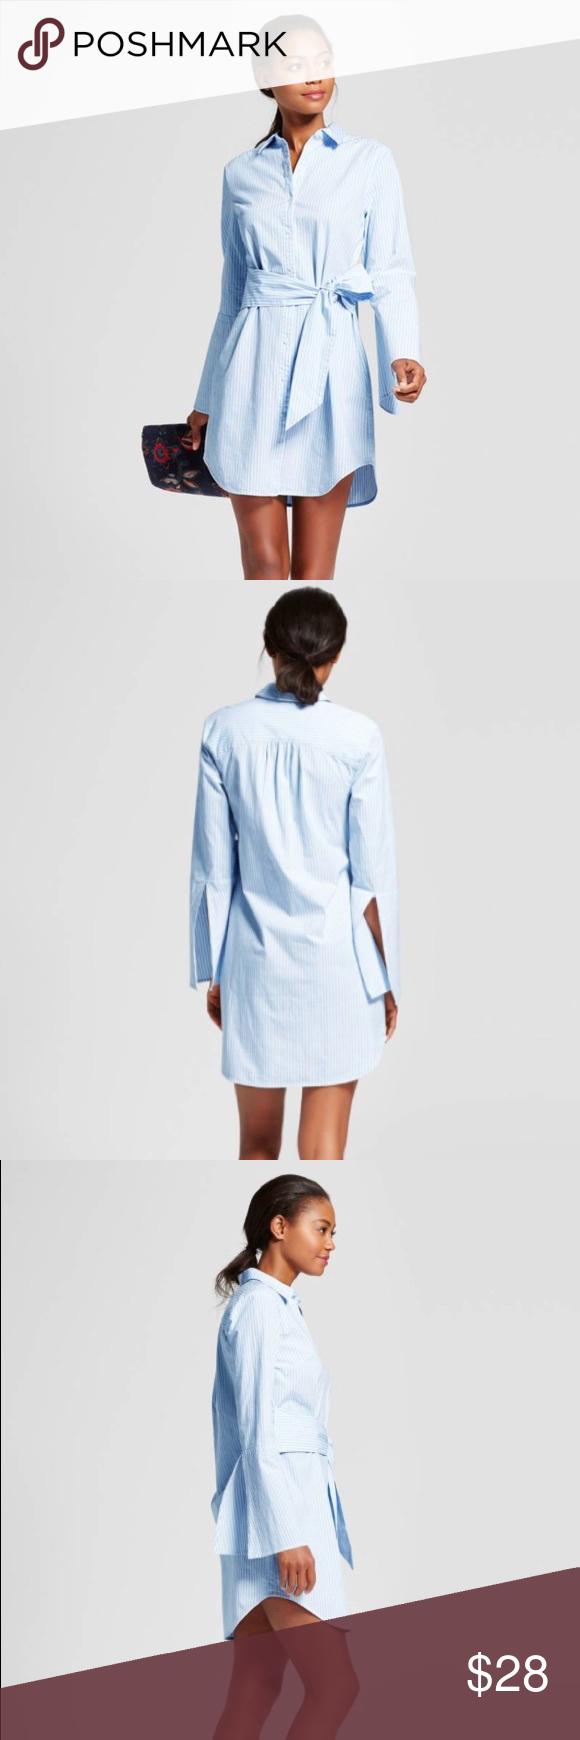 Nwt A New Day Pinstripe Shirt Dress Clothes Design Pinstripe A New Day [ 1740 x 580 Pixel ]